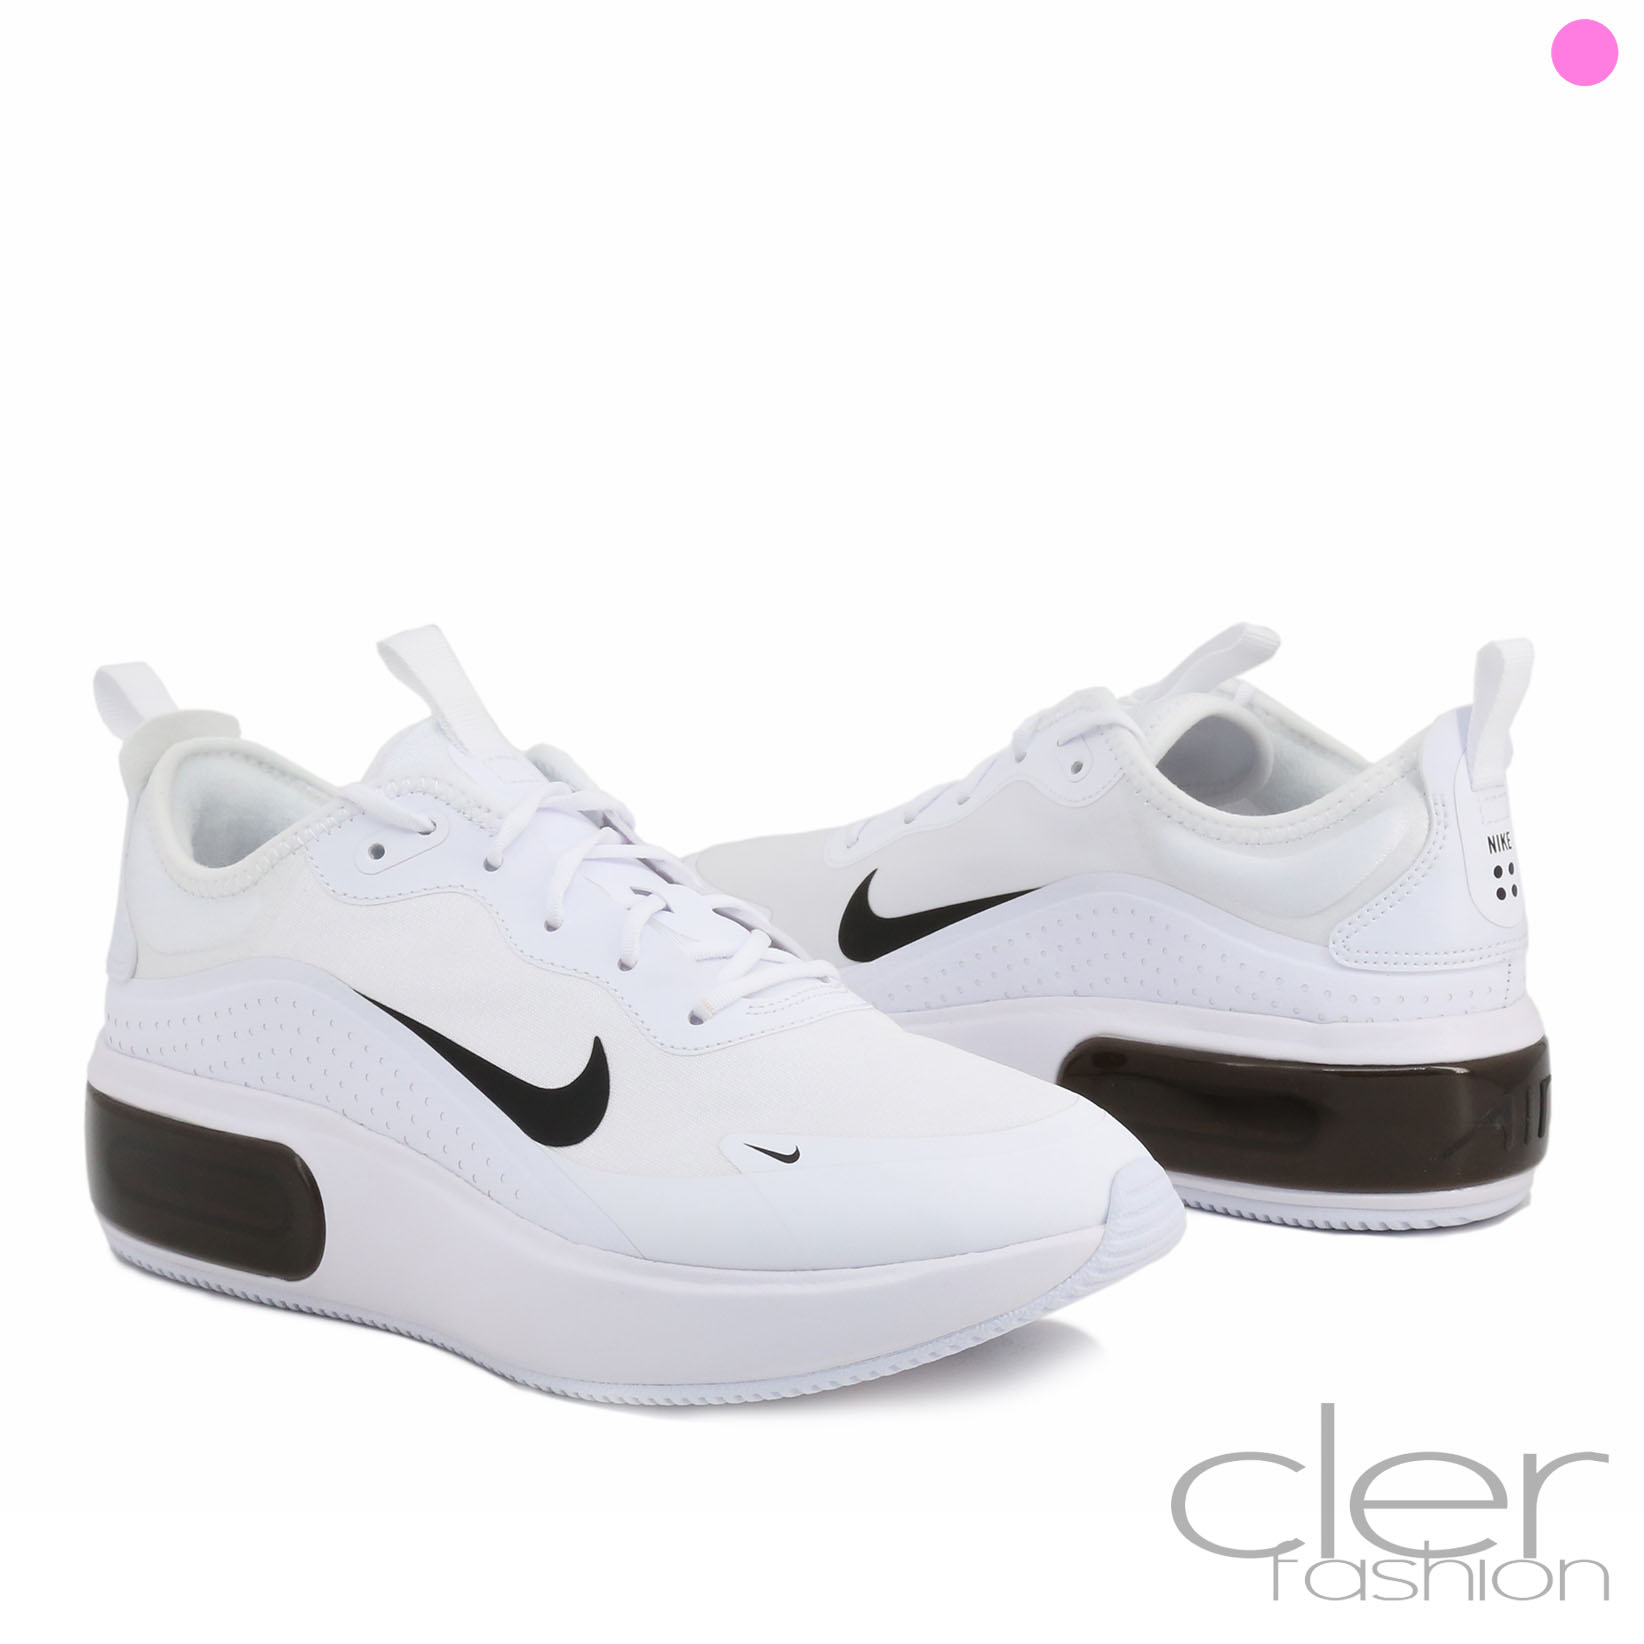 Sneakers Mujer Nike AirMaxDiaW-B Mujer Blanco 108159 Originales